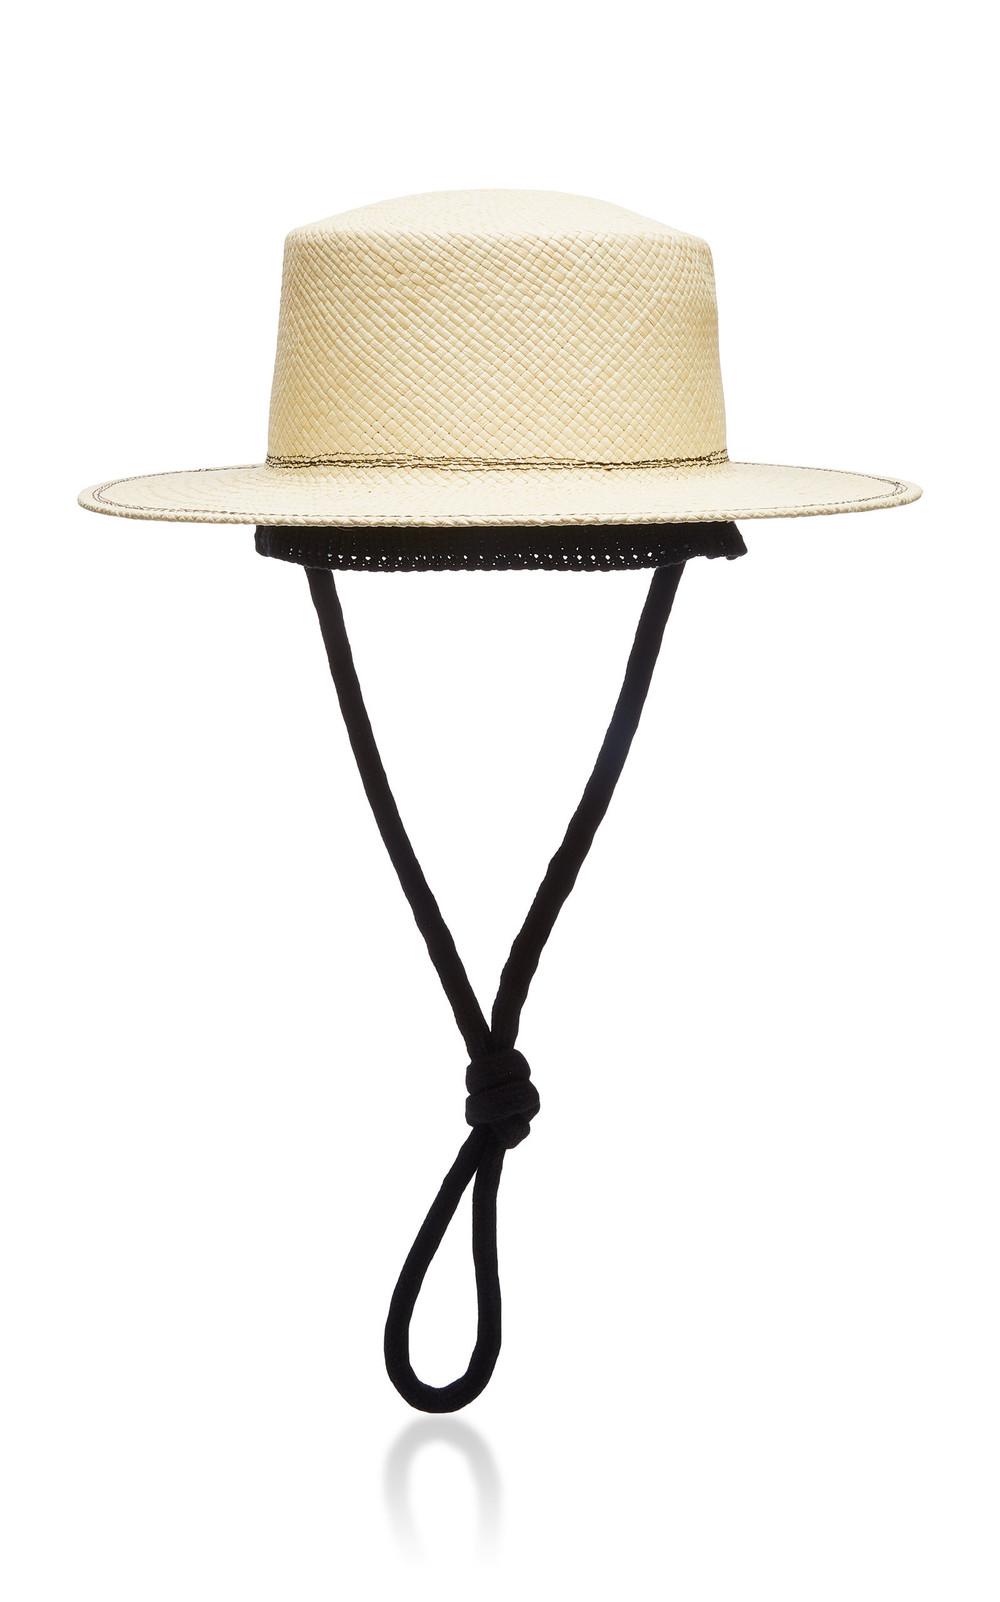 Federica Moretti Cotton-Trimmed Straw Hat in neutral